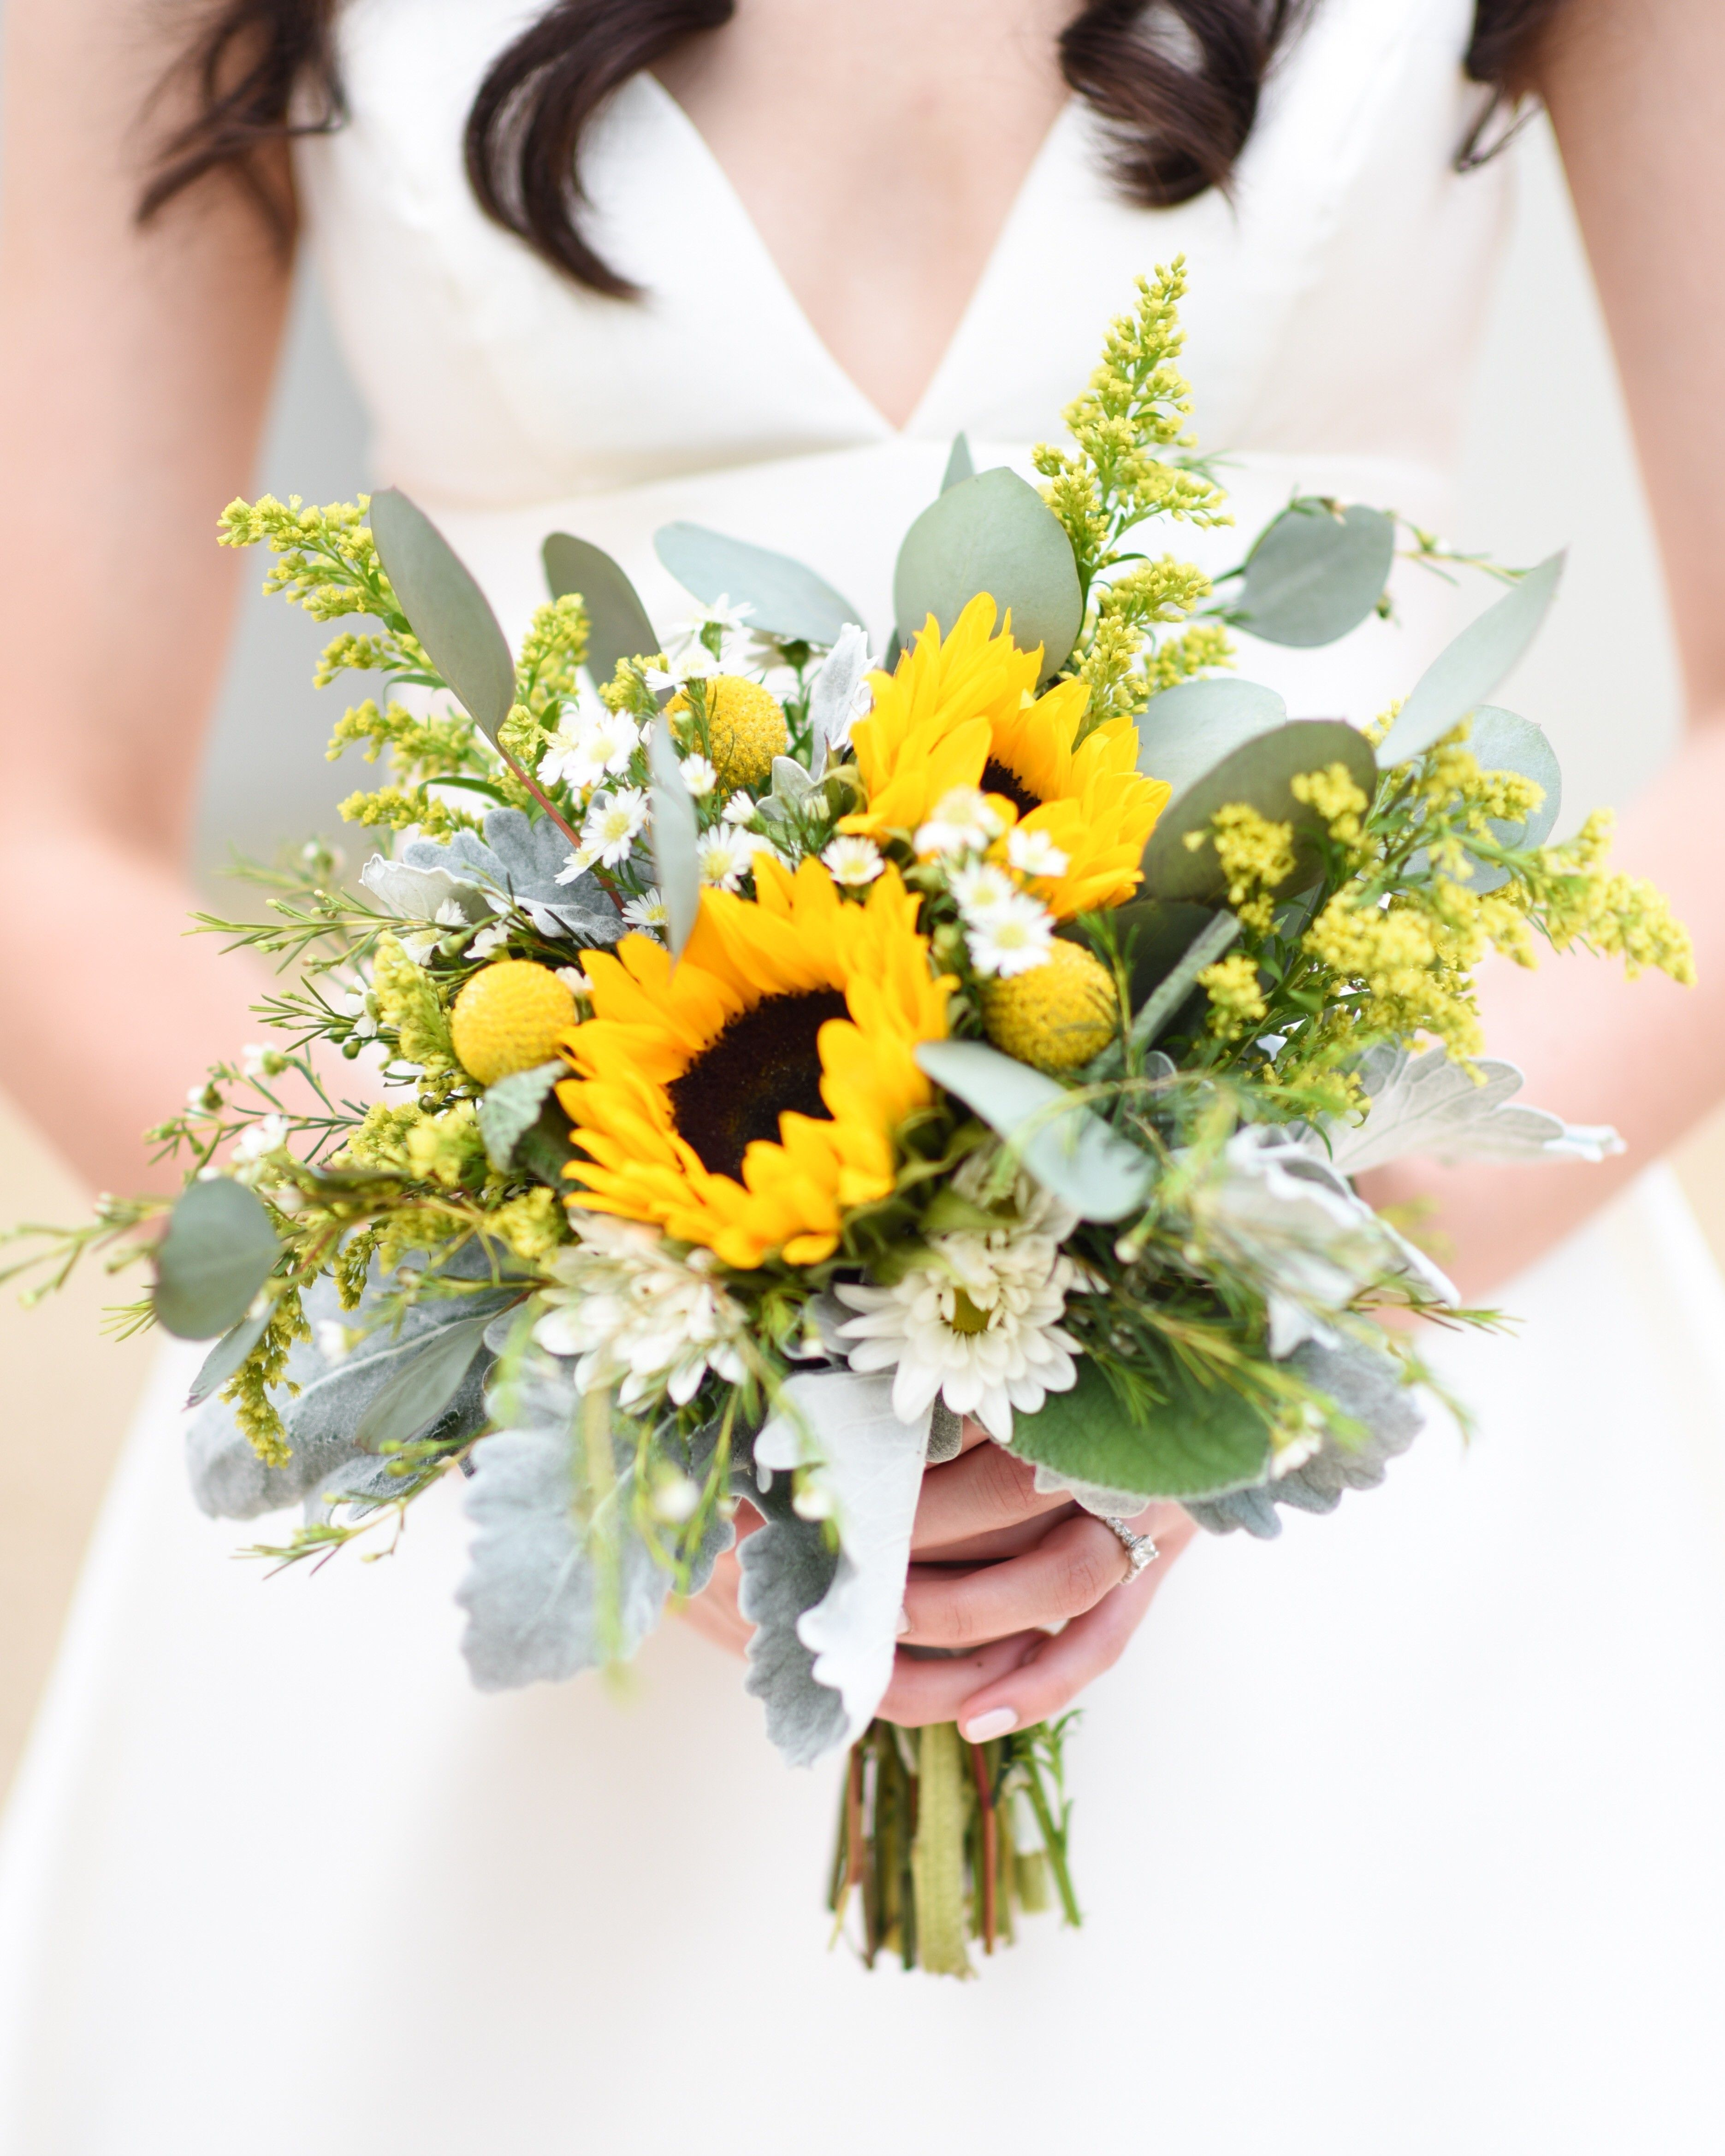 20 Sunflower Bouquets That Will Brighten Up Your Wedding Day Yellow Wedding Bouquet Sunflower Wedding Bouquet Fall Wedding Bouquets